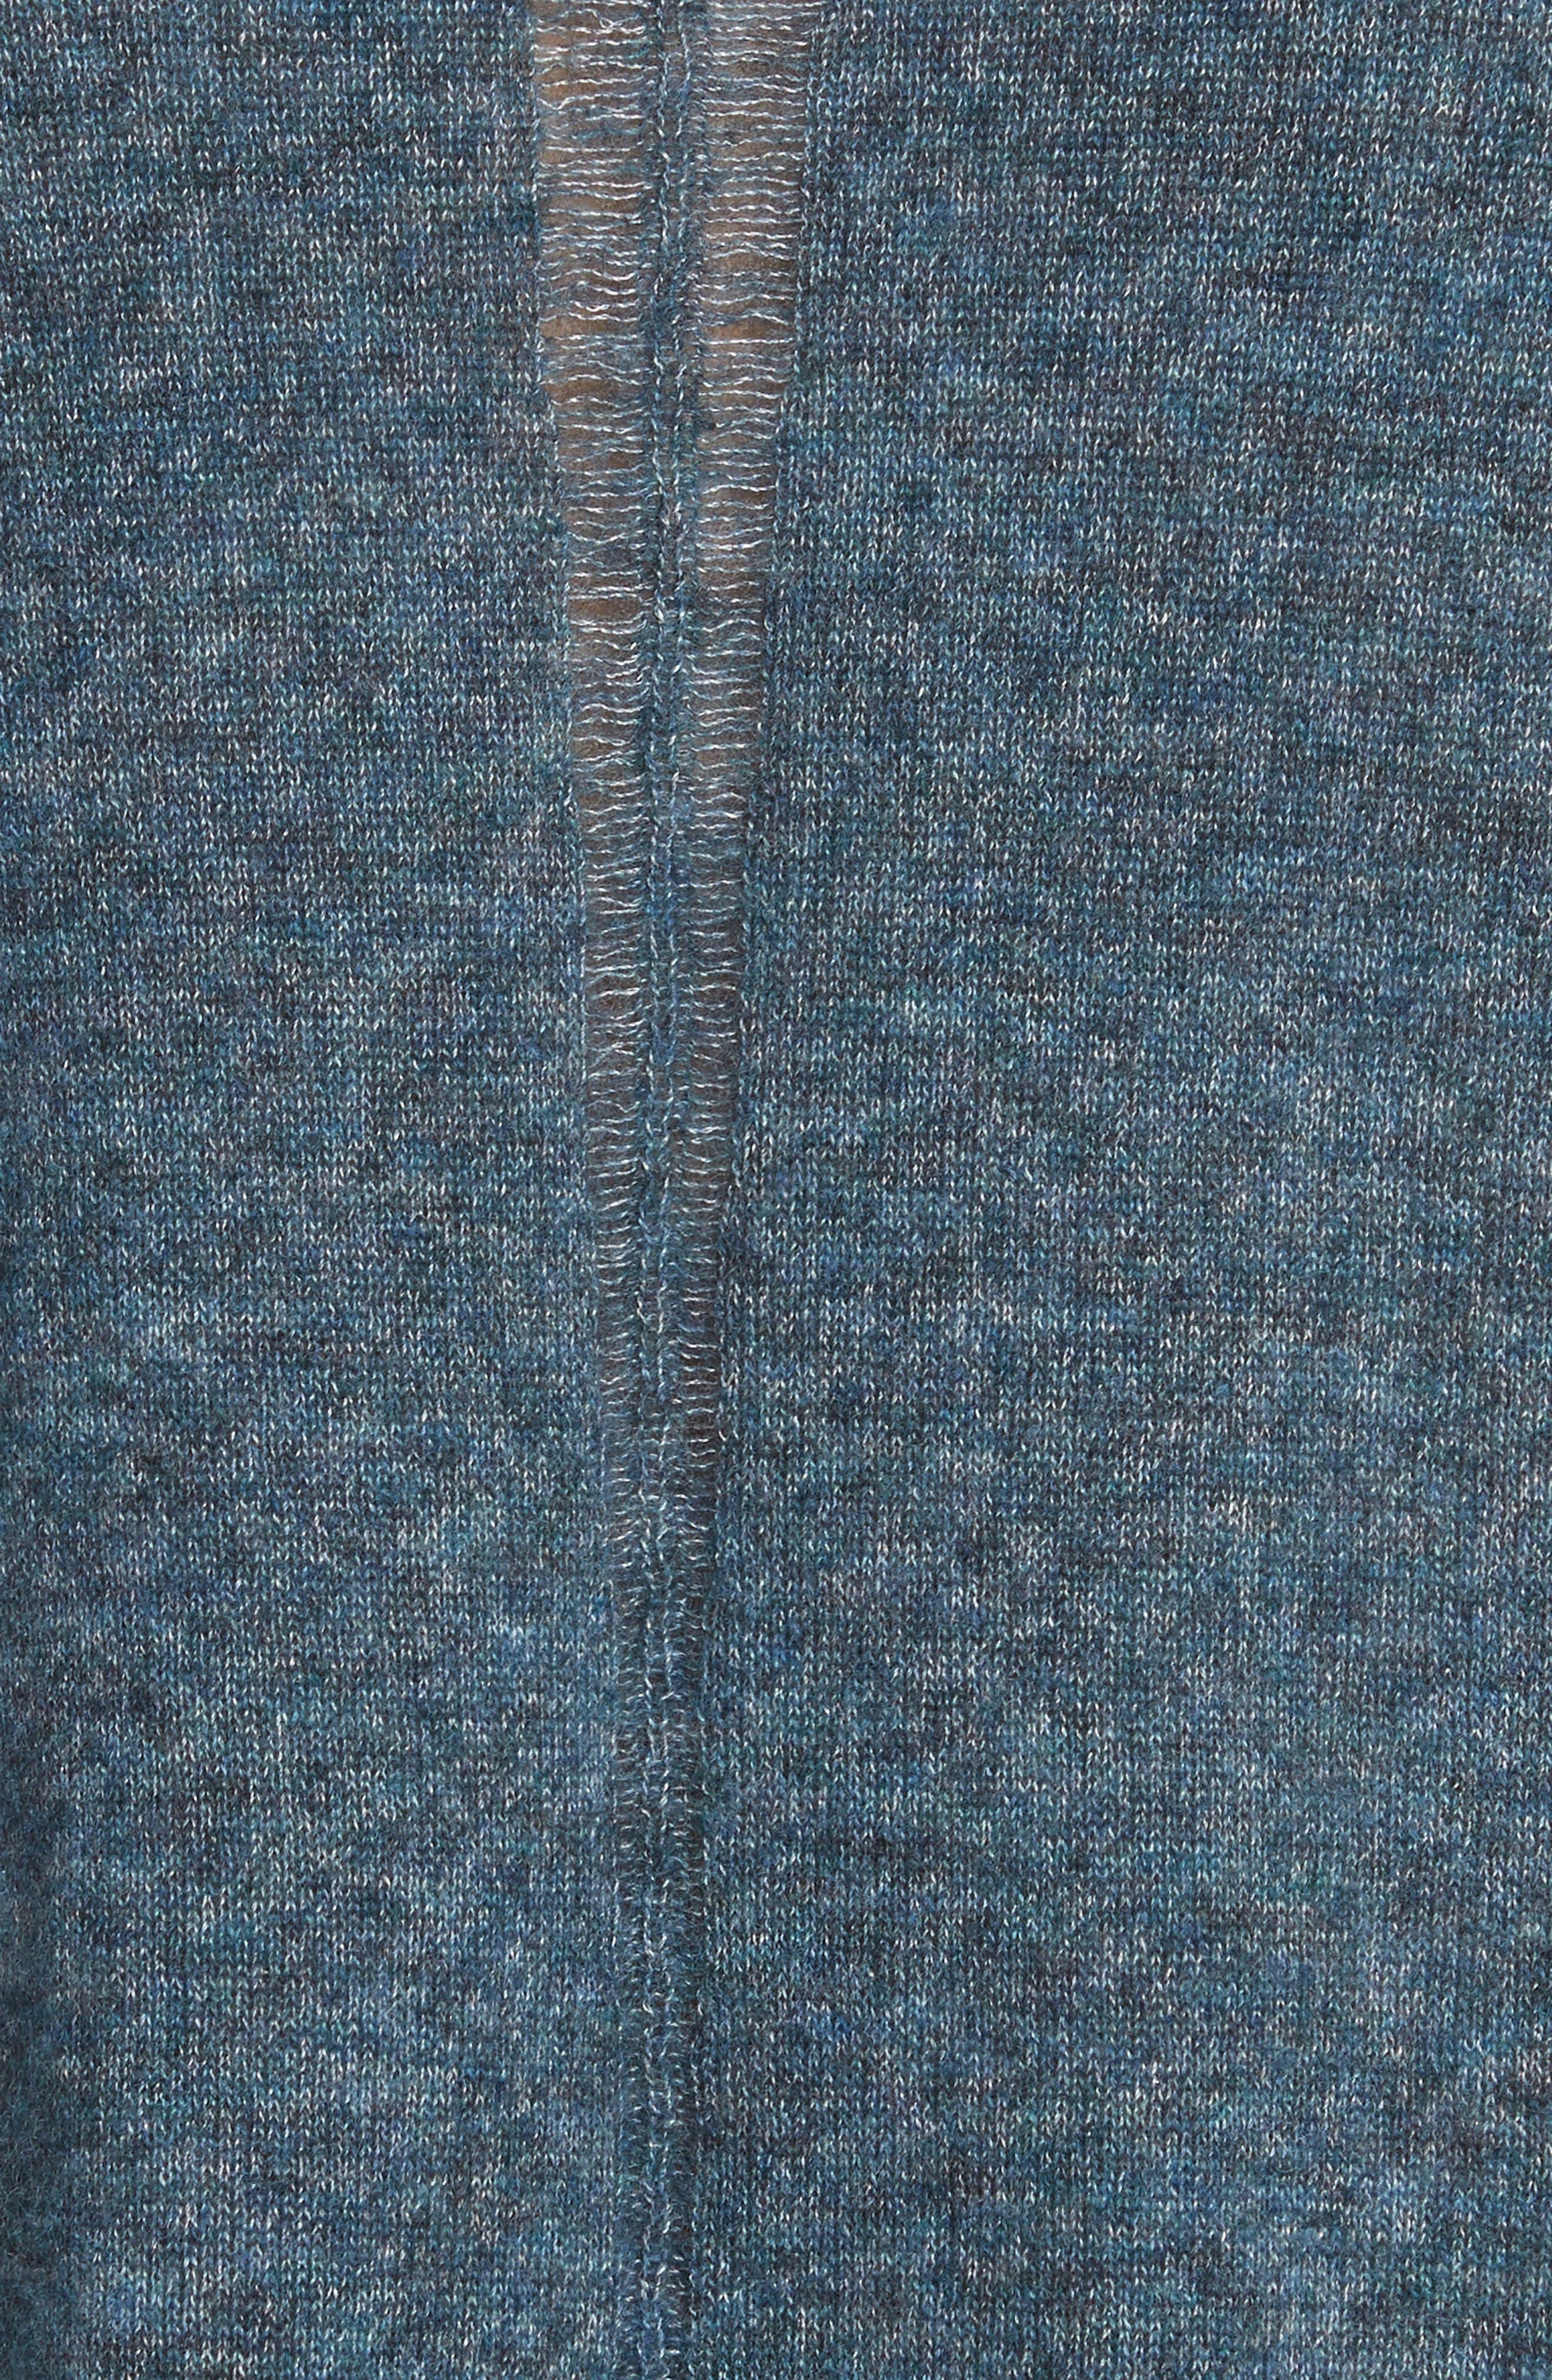 Boxy Ladder Stitch Cashmere & Silk Sweater,                             Alternate thumbnail 5, color,                             256